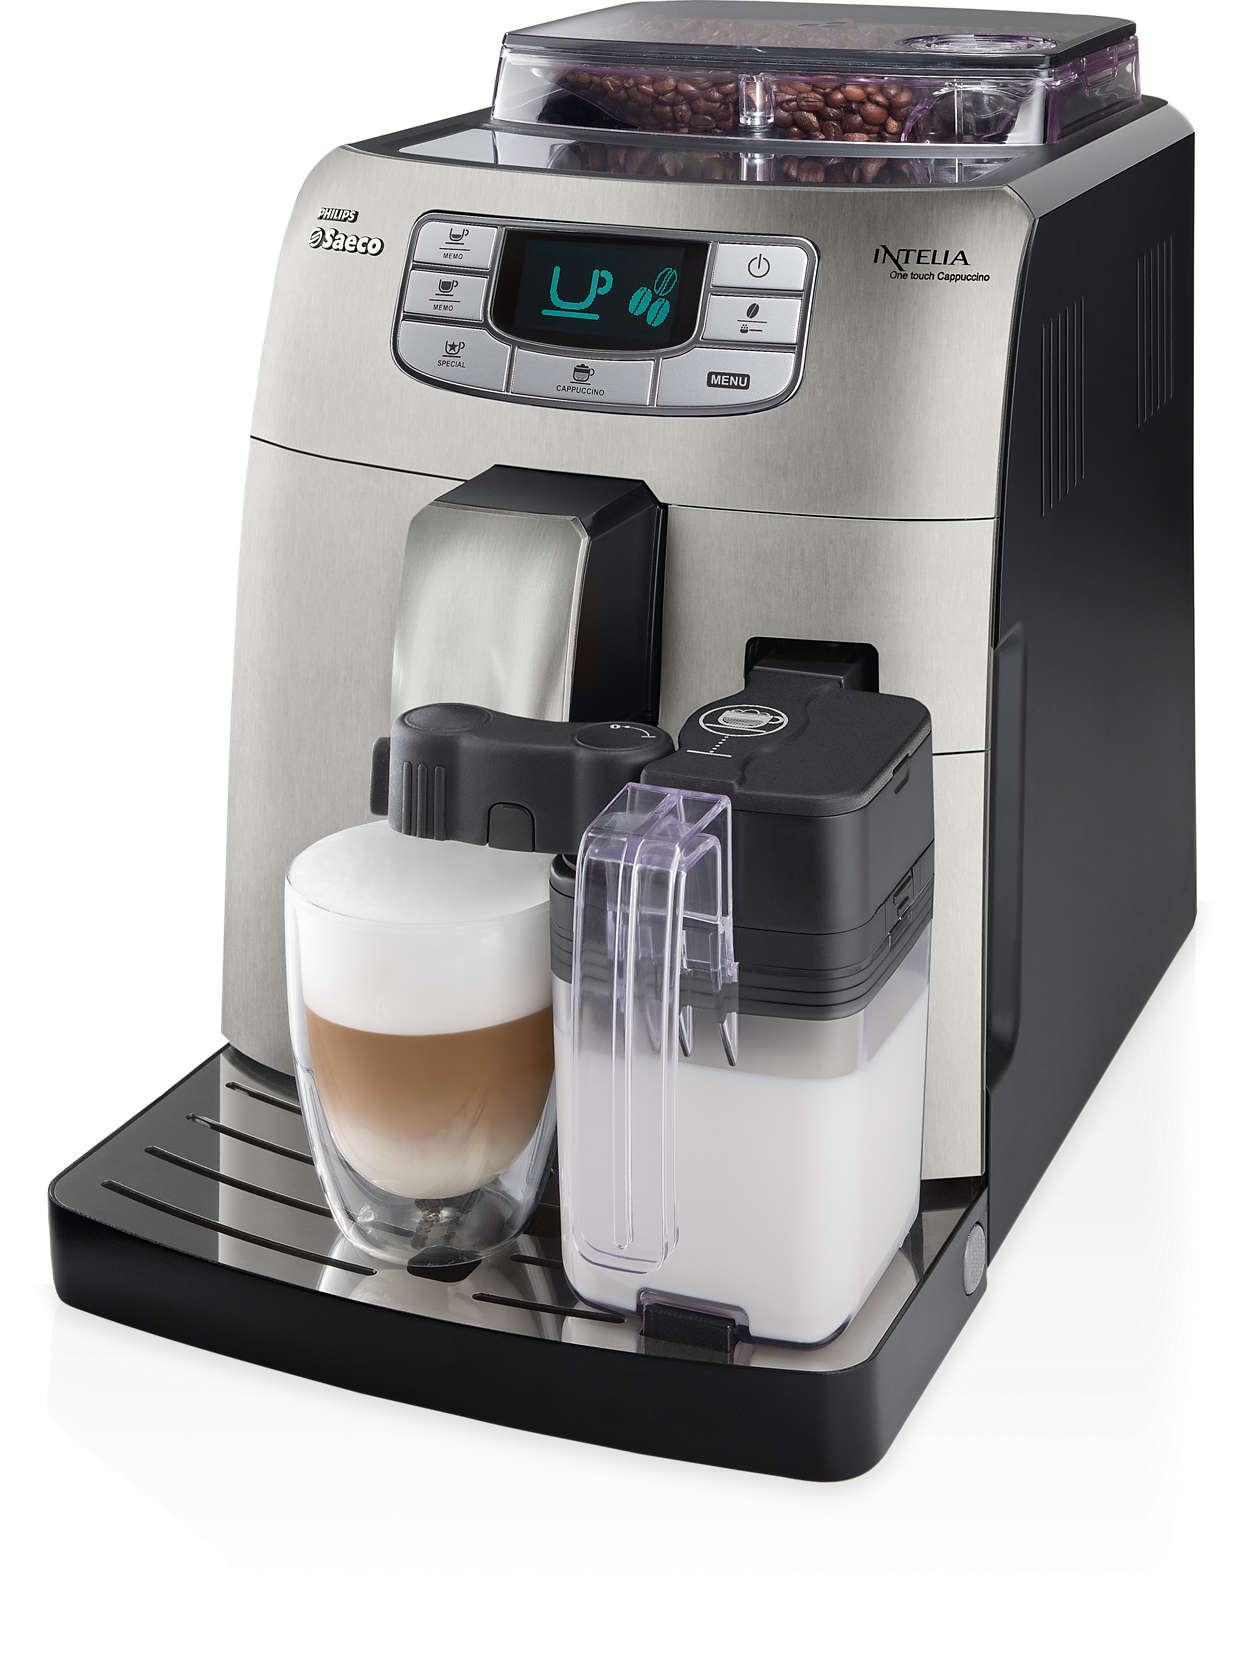 Espresso et cappuccino d'une simple touche